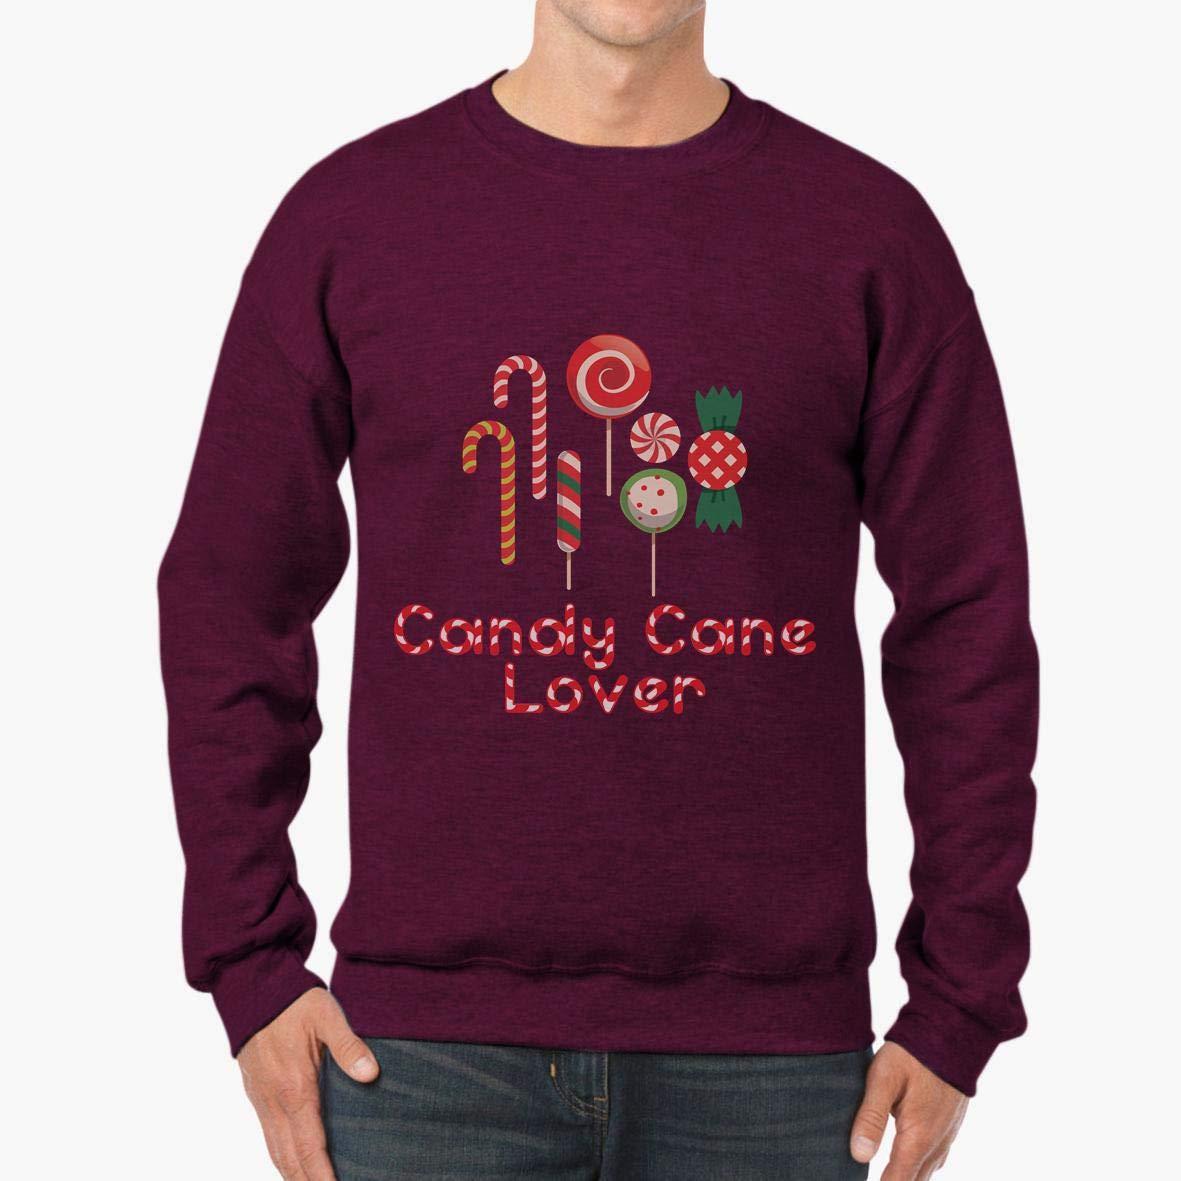 Doryti Candy Cane Lover Cute Holiday Funny Xmas Spirit Unisex Sweatshirt tee